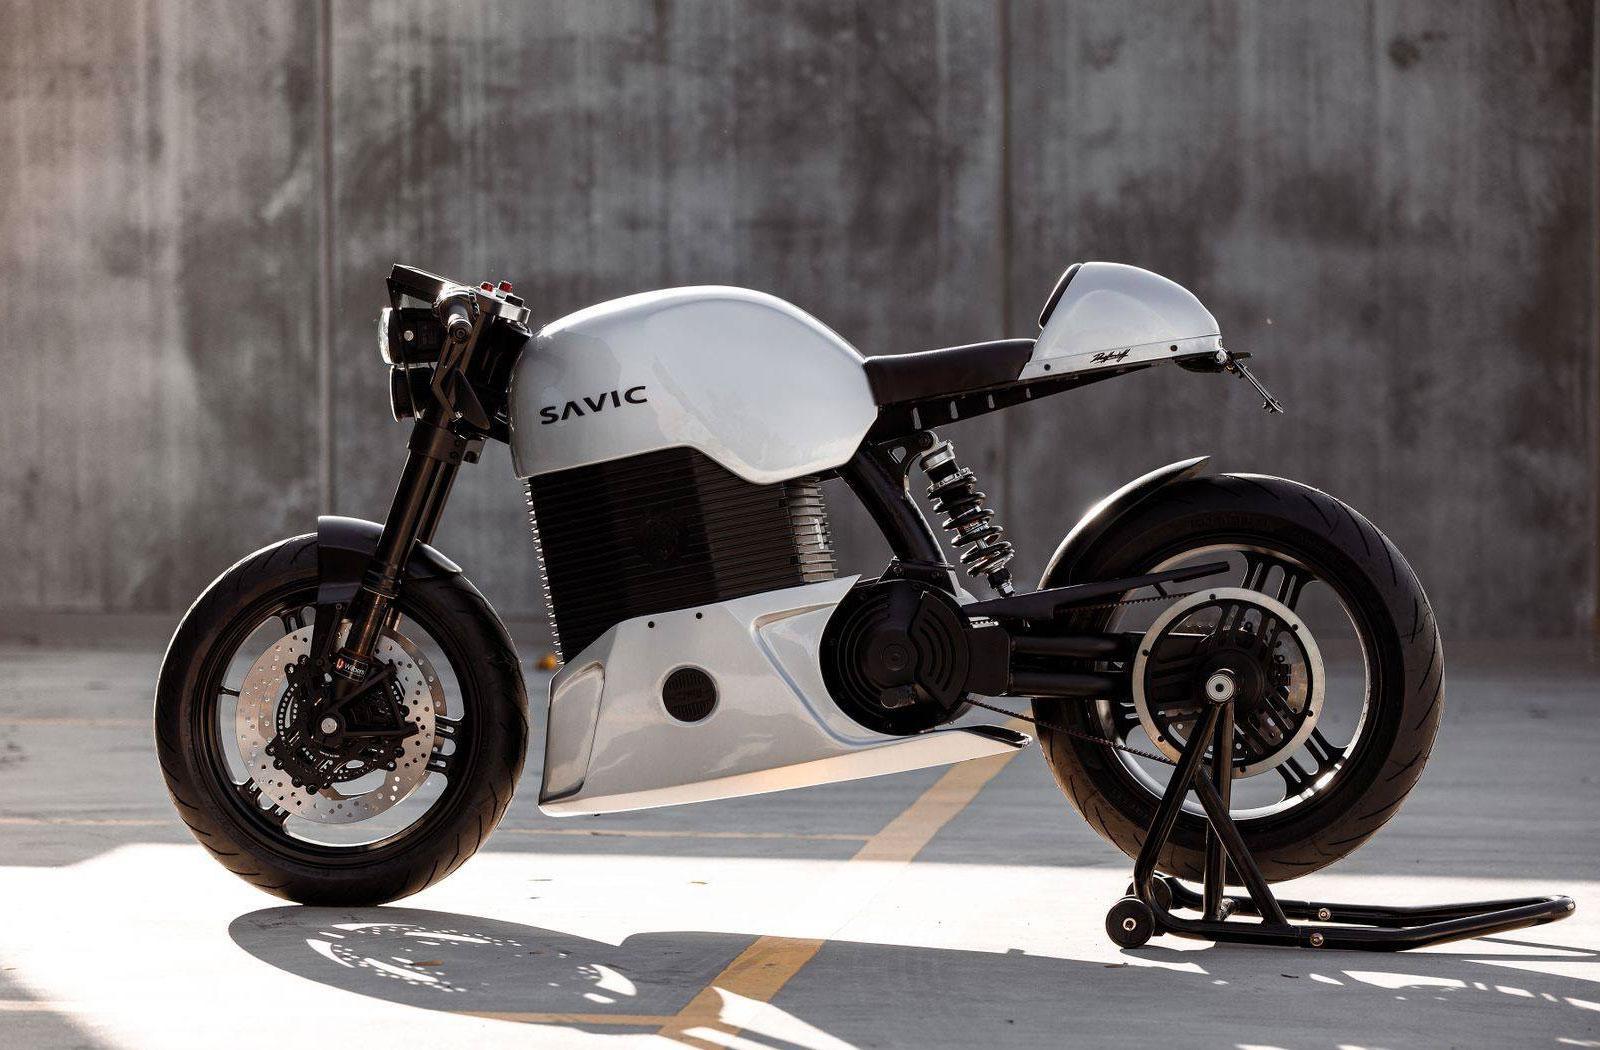 Savic Motorcycles electric cafe racer